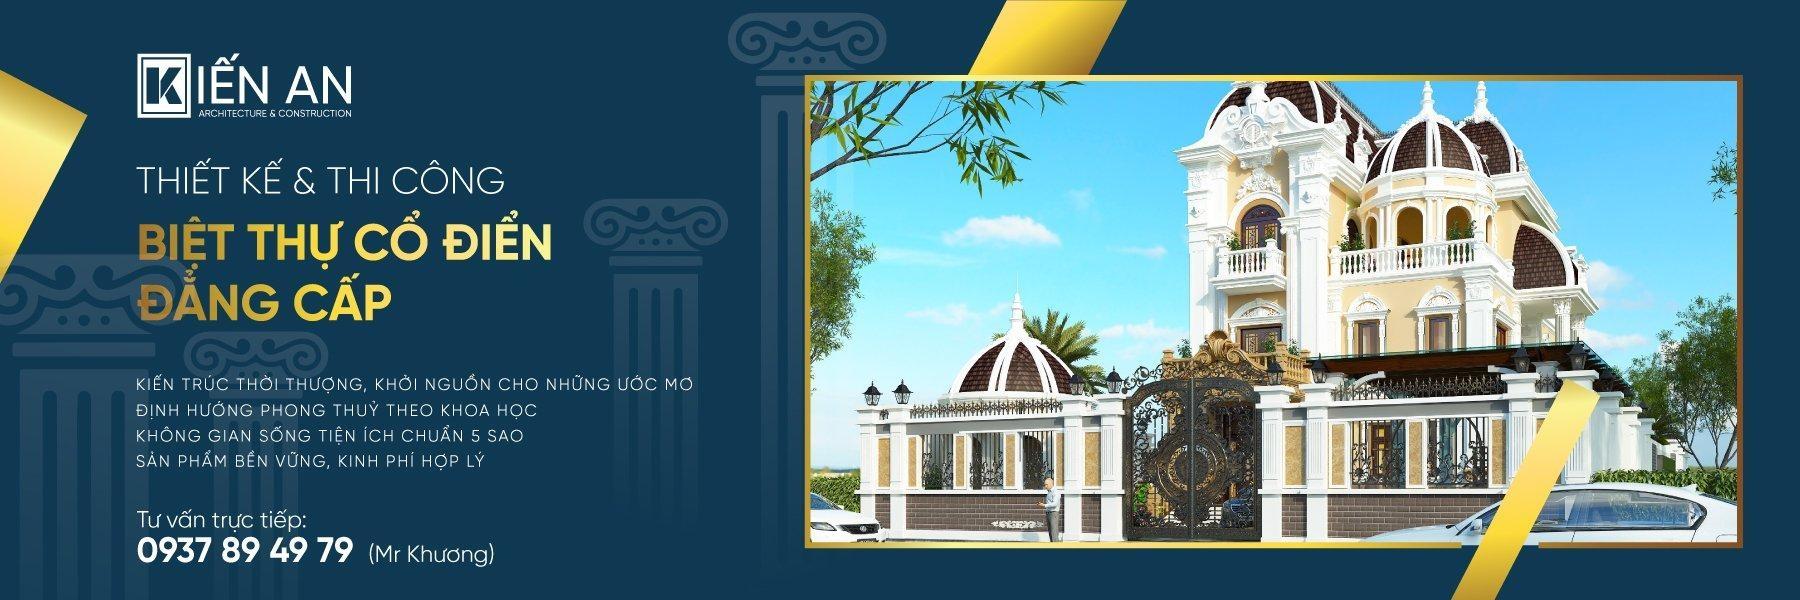 Thiết Kế Biệt Thự Kiến An (@thietkebietthukienan) Cover Image